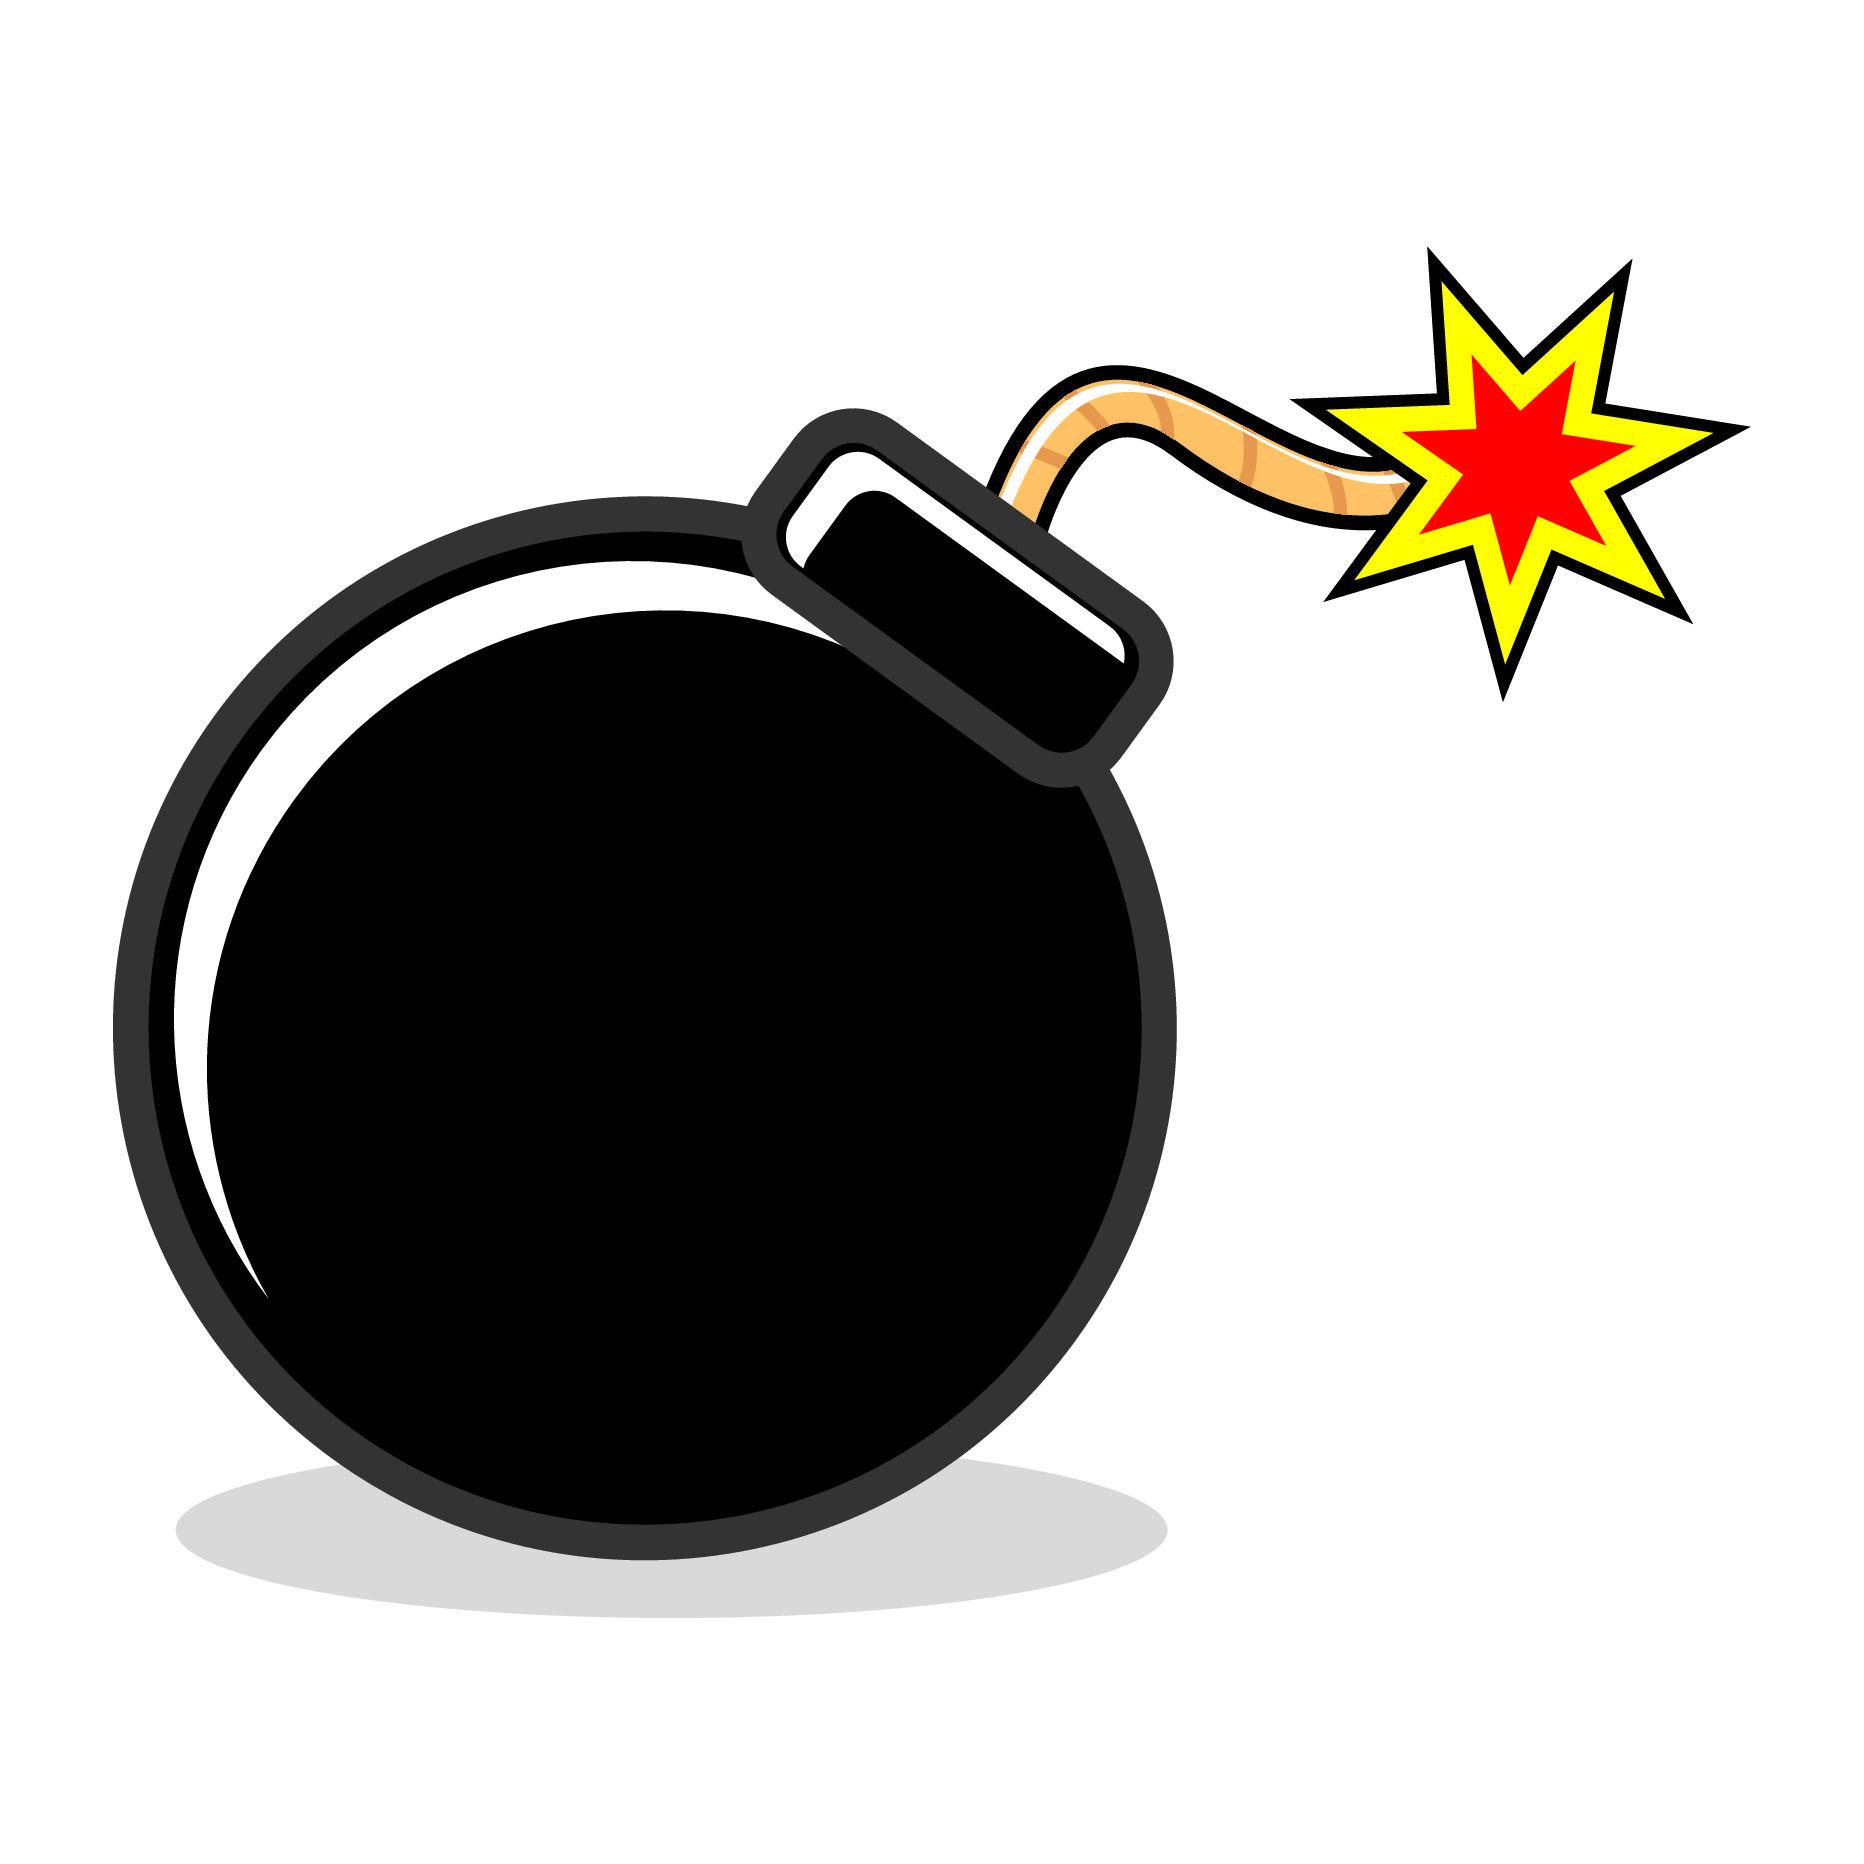 Bomb clipart comic. Cartoon google search thank